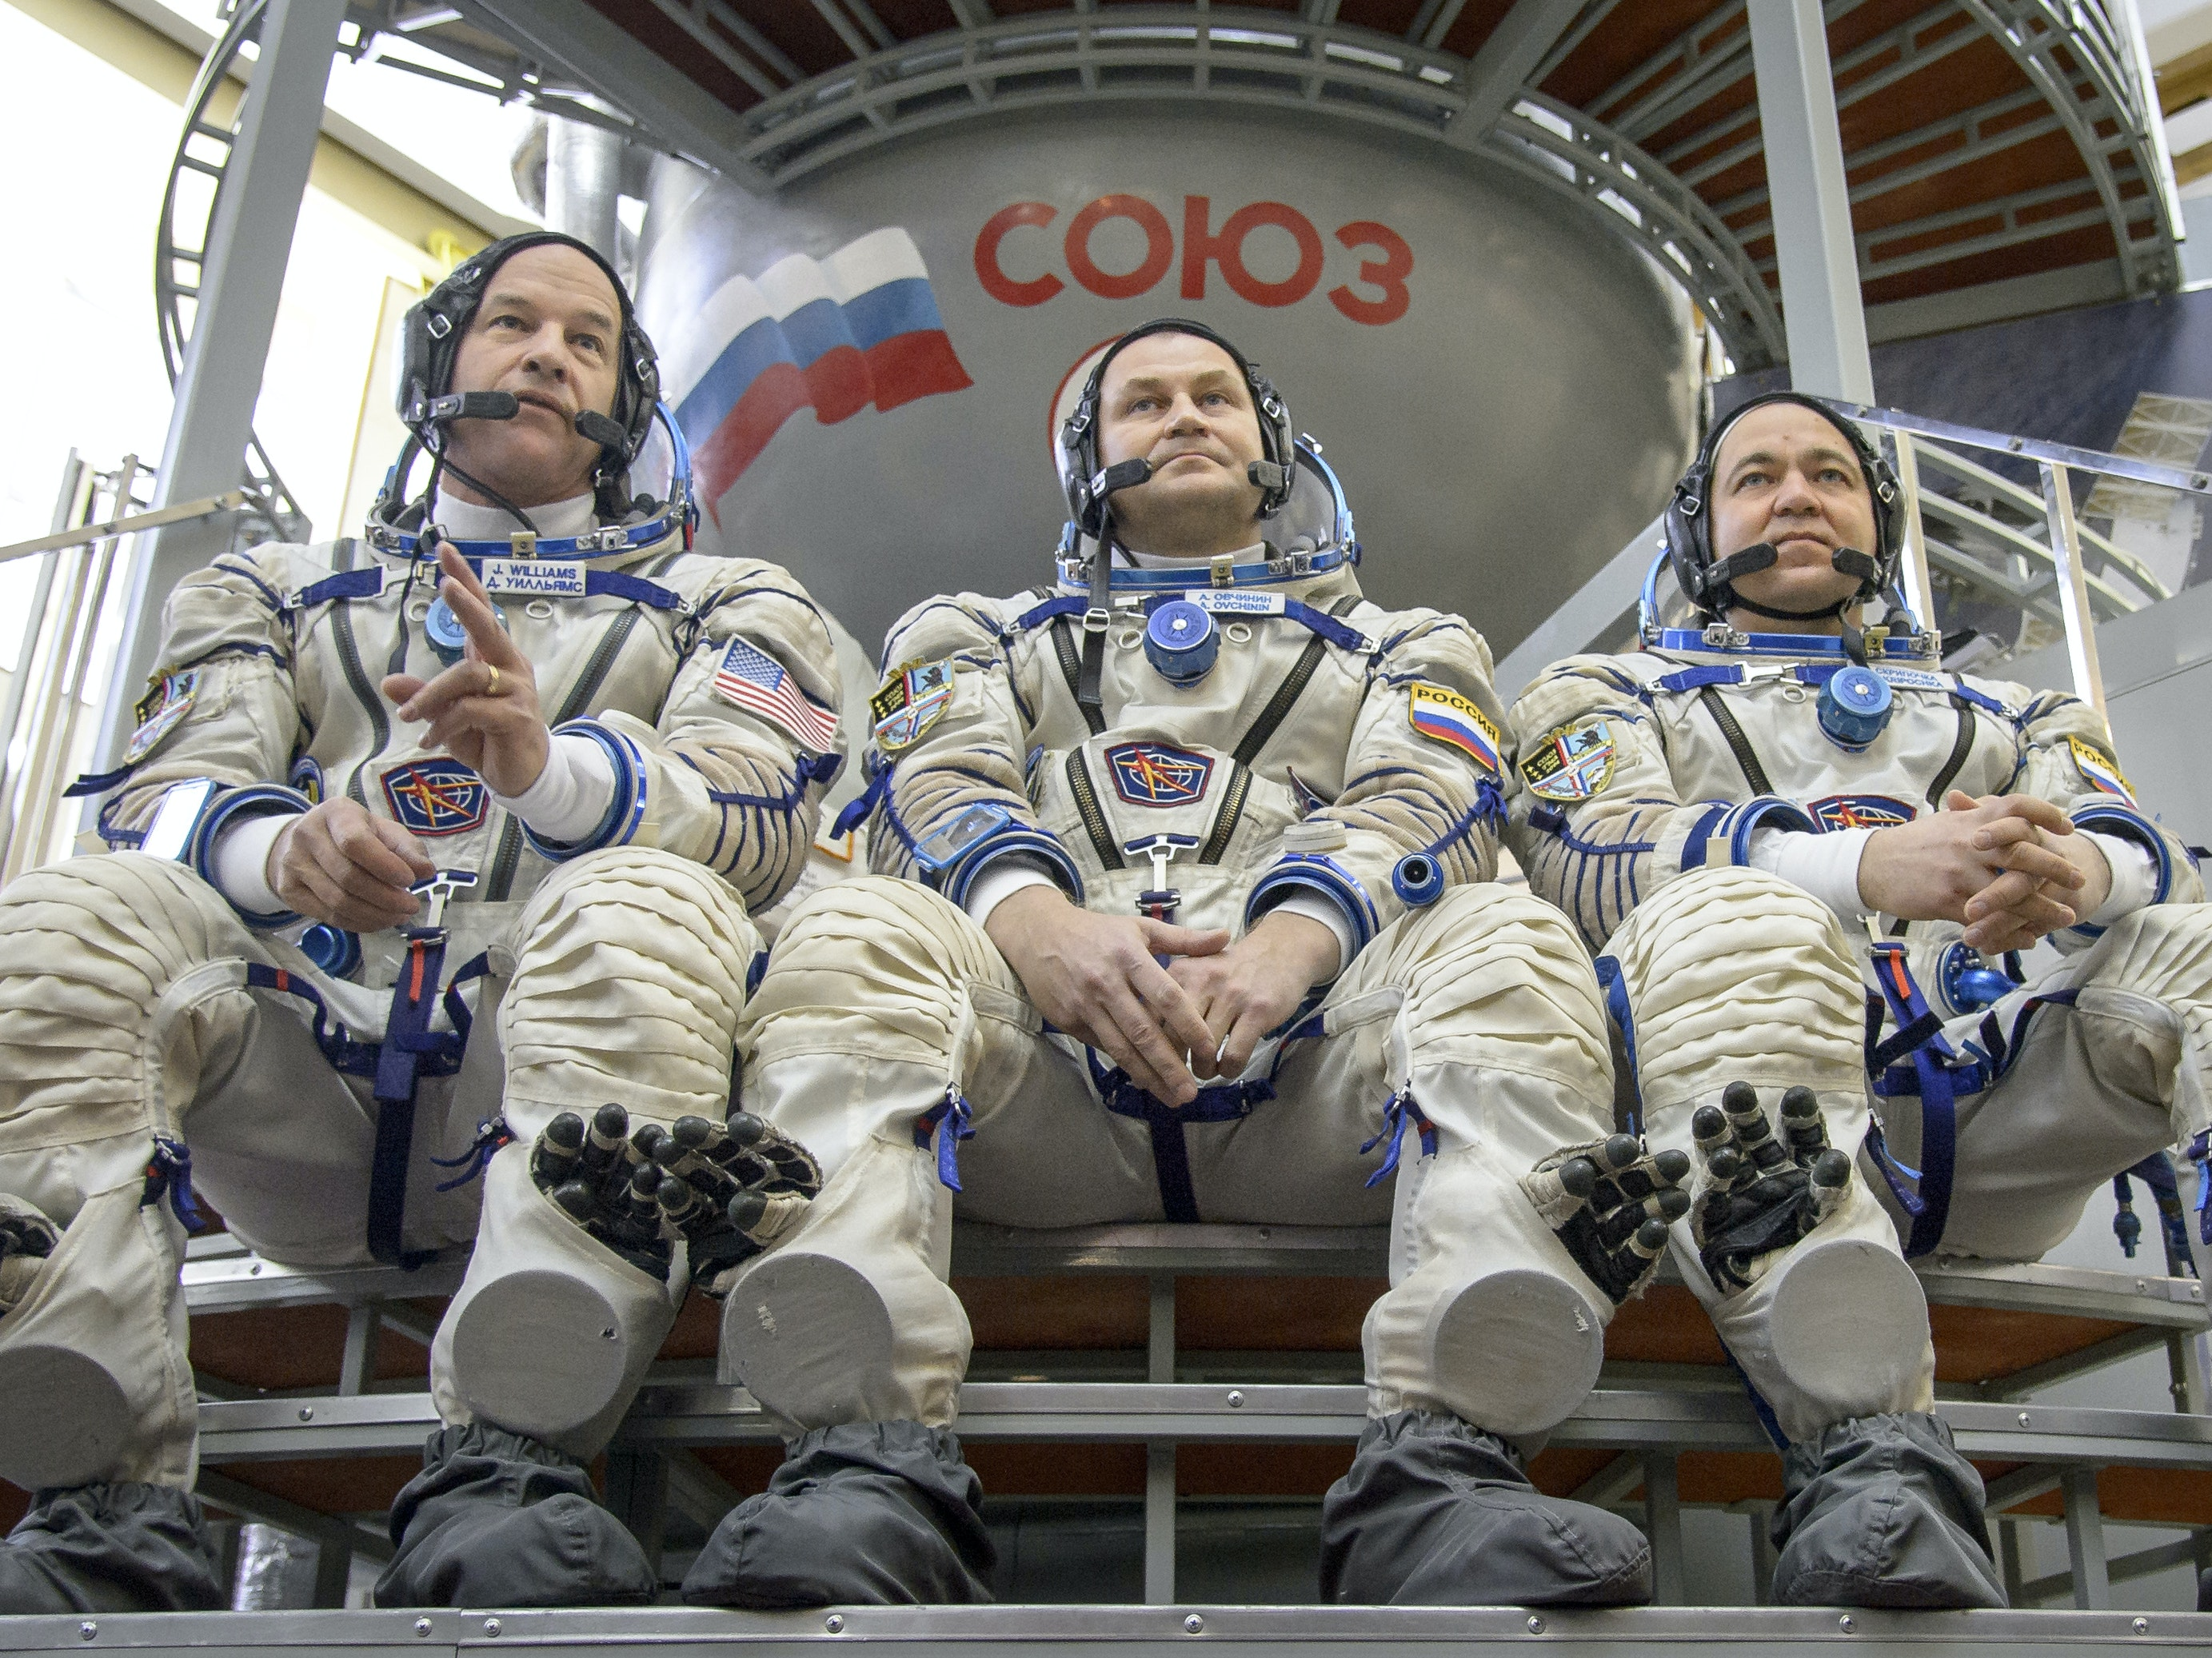 Jeff Williams Will Surpass Scott Kelly's Space Record